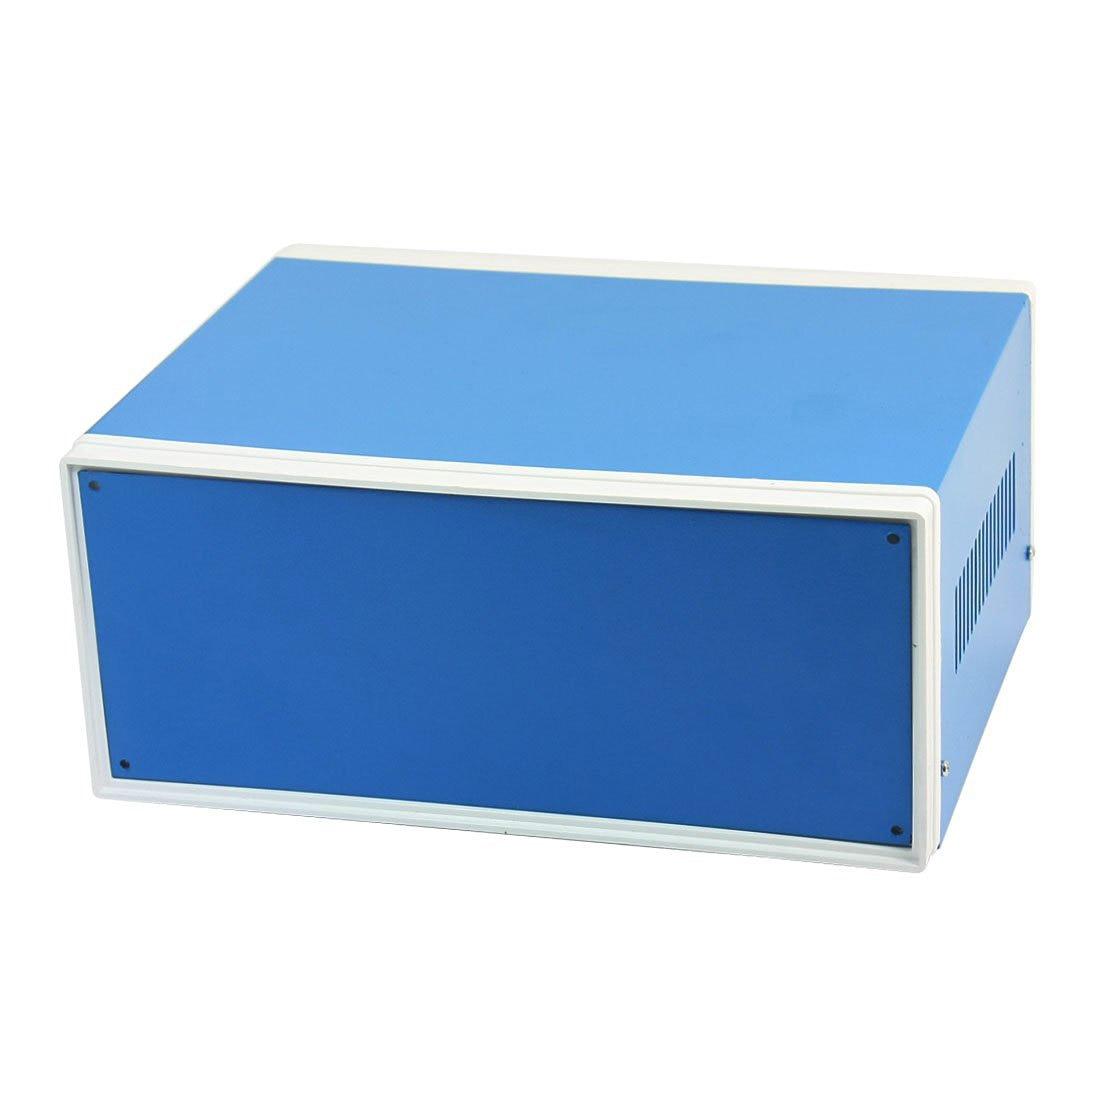 Terminals 9.8 X 7.5 X 4.3 Blue Metal Enclosure Project Case Diy Junction Box Delaying Senility